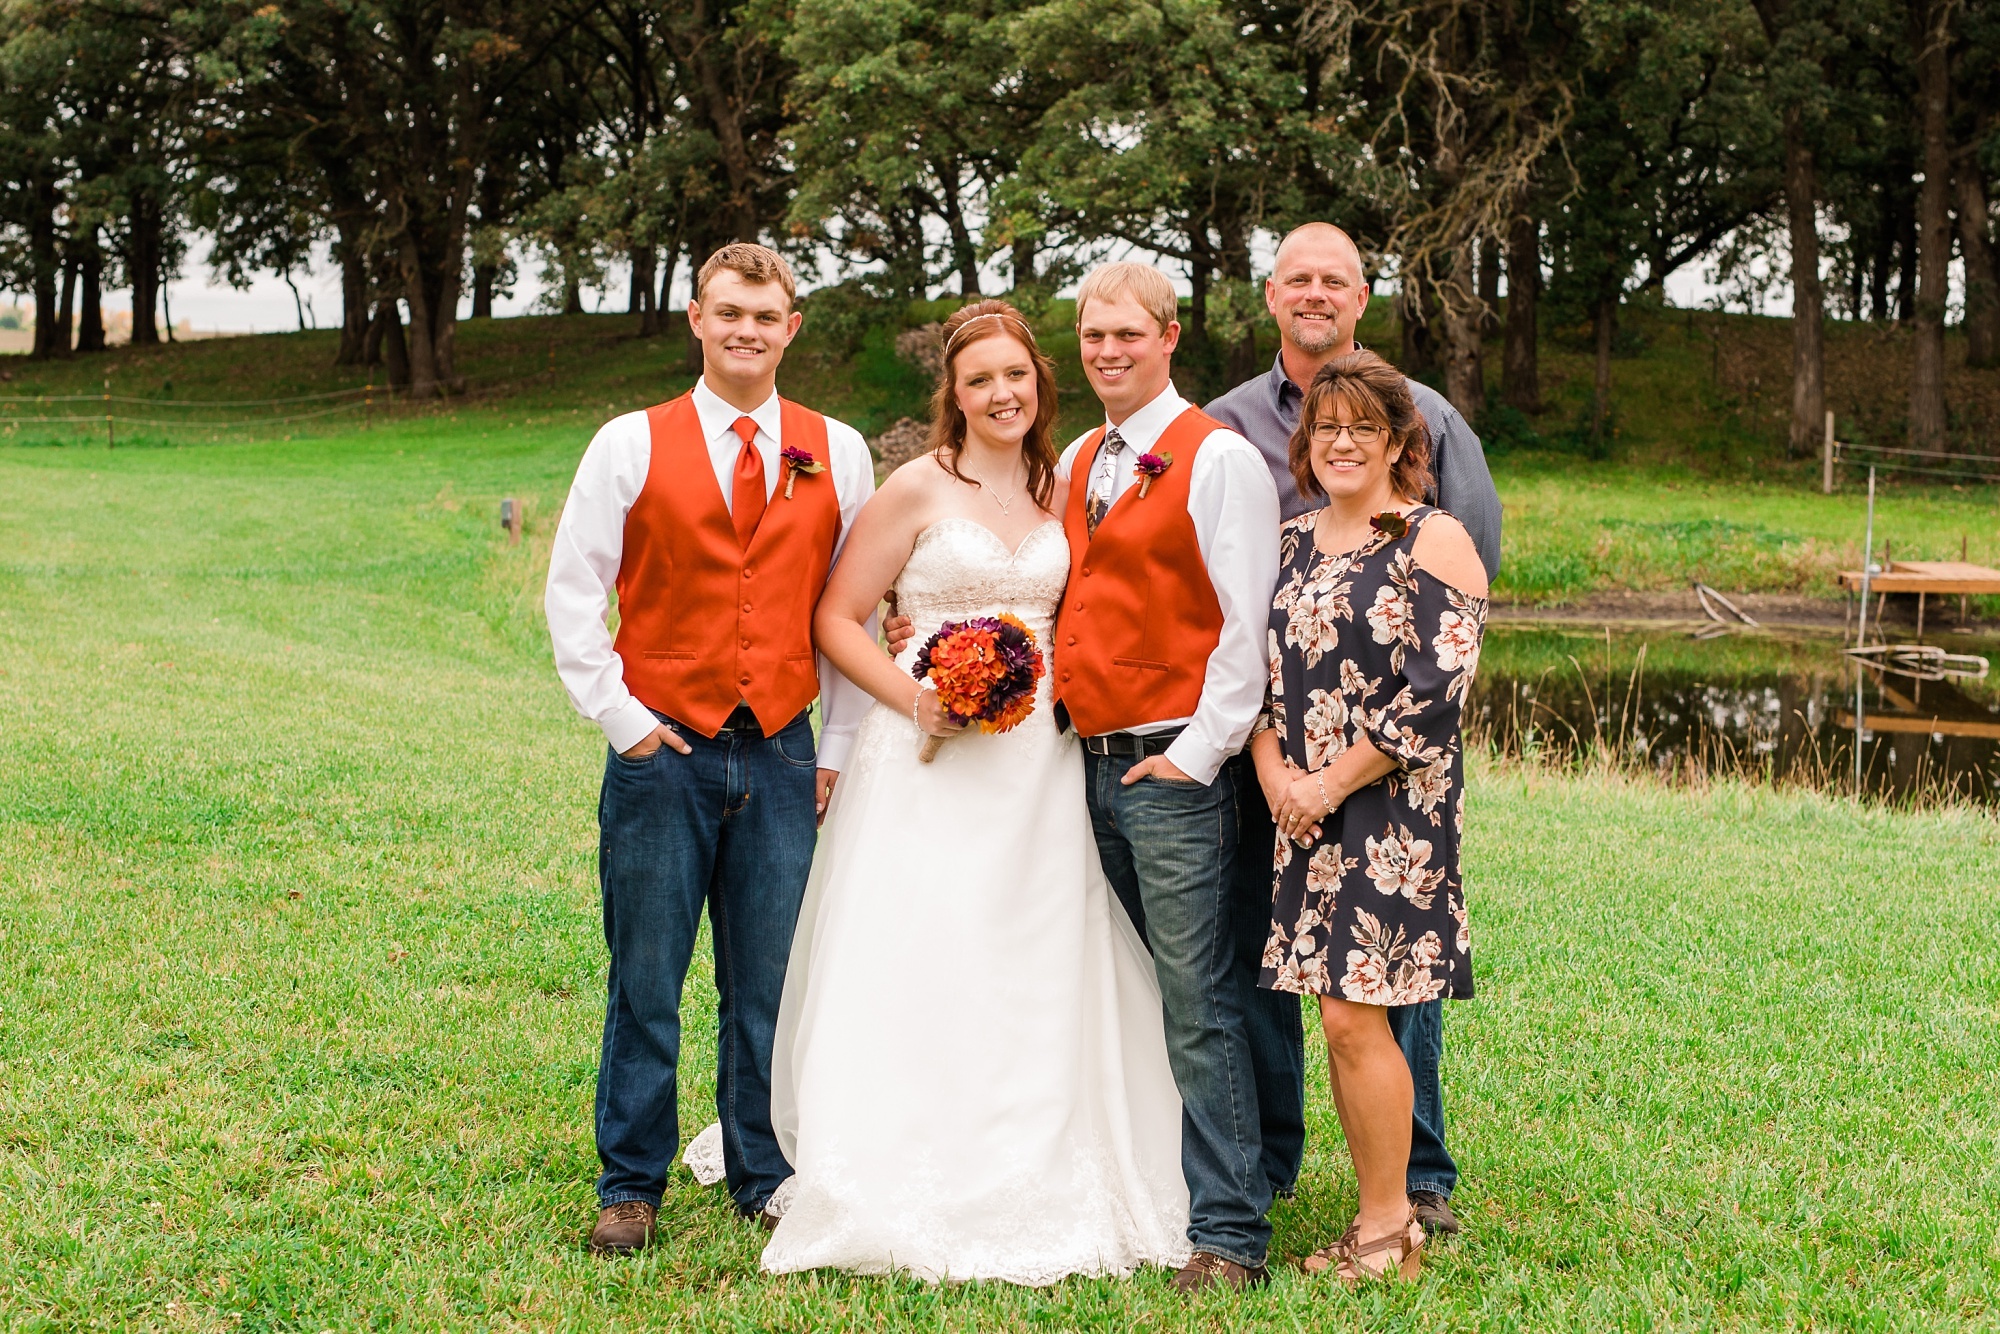 Amber Langerud_Lake Park MN Barn wedding at the Hitching Post_0431.jpg